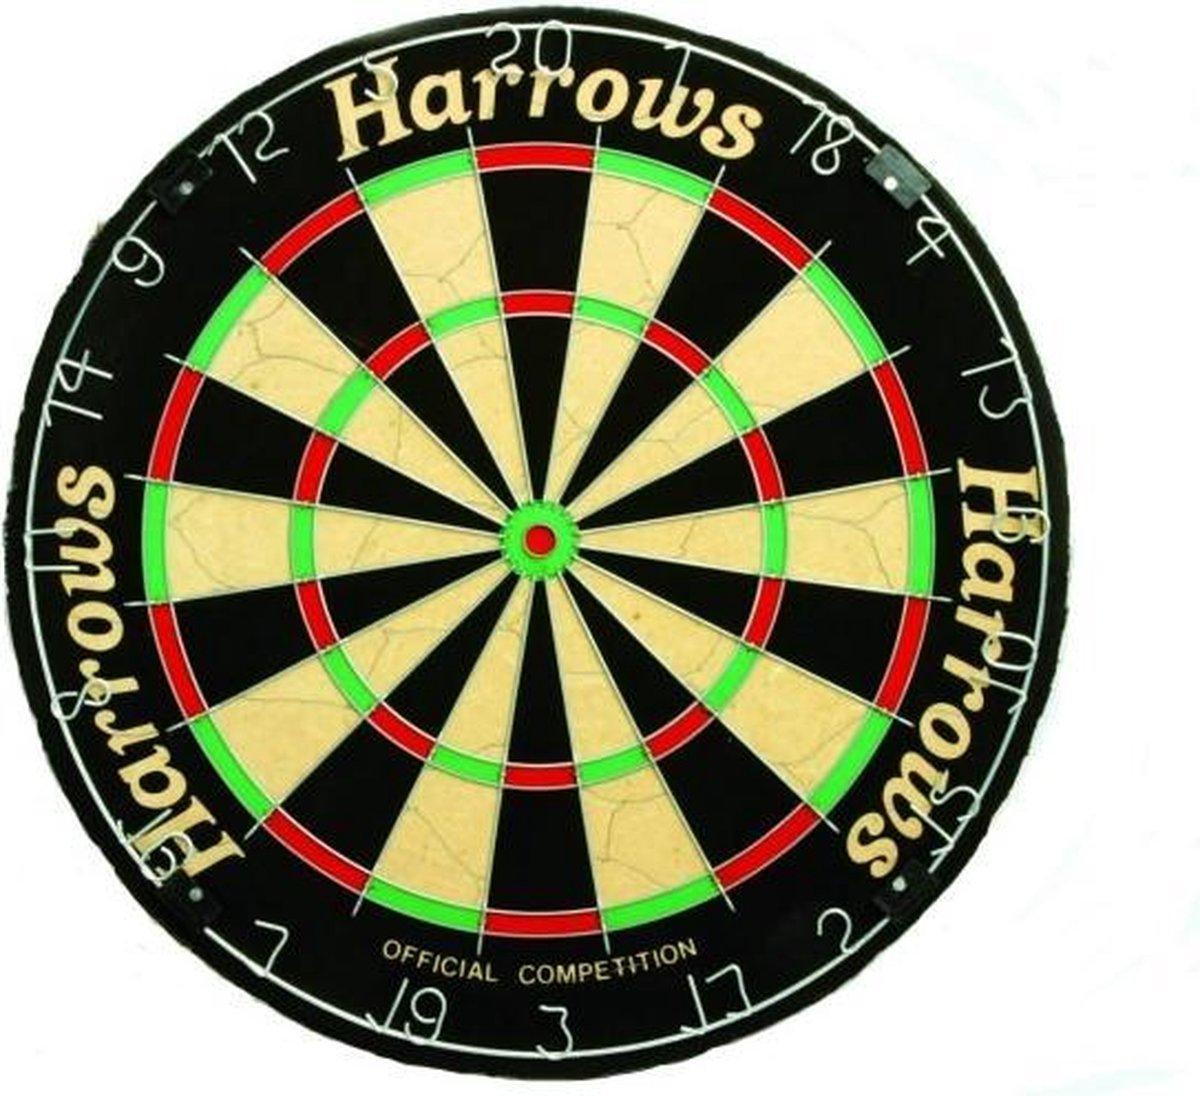 Harrows Electro Series 3 - Elektronisch Dartbord